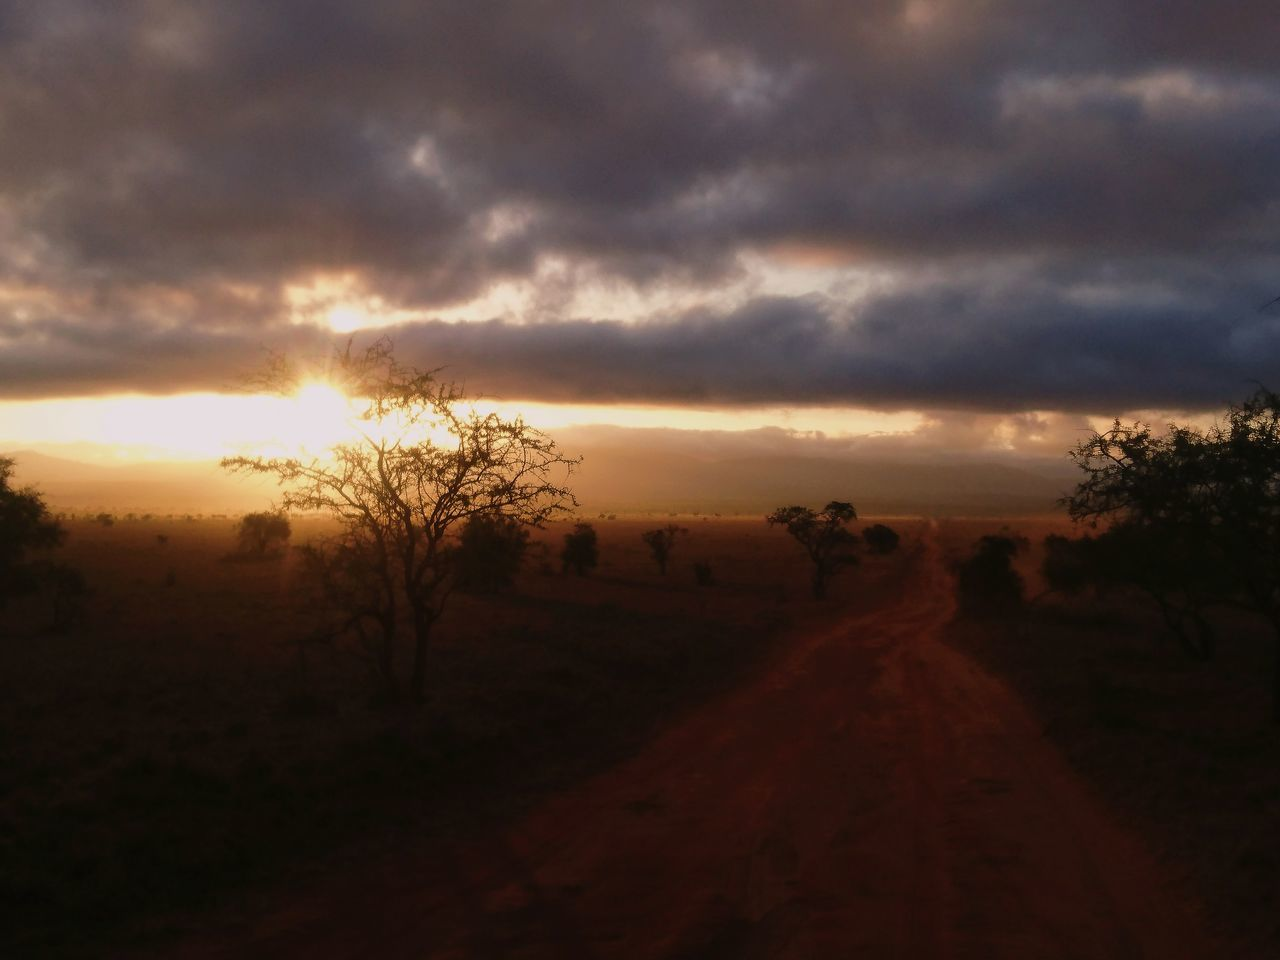 Sunrise Nature Beauty In Nature Sky Tree Cloud - Sky Dramatic Sky Taitahills Tsavo Savannah EyeEm Best Shots EyeEm Best Edits Africa Safari VSCO Miles Away Kenya Travel Destinations Landscape Adventure